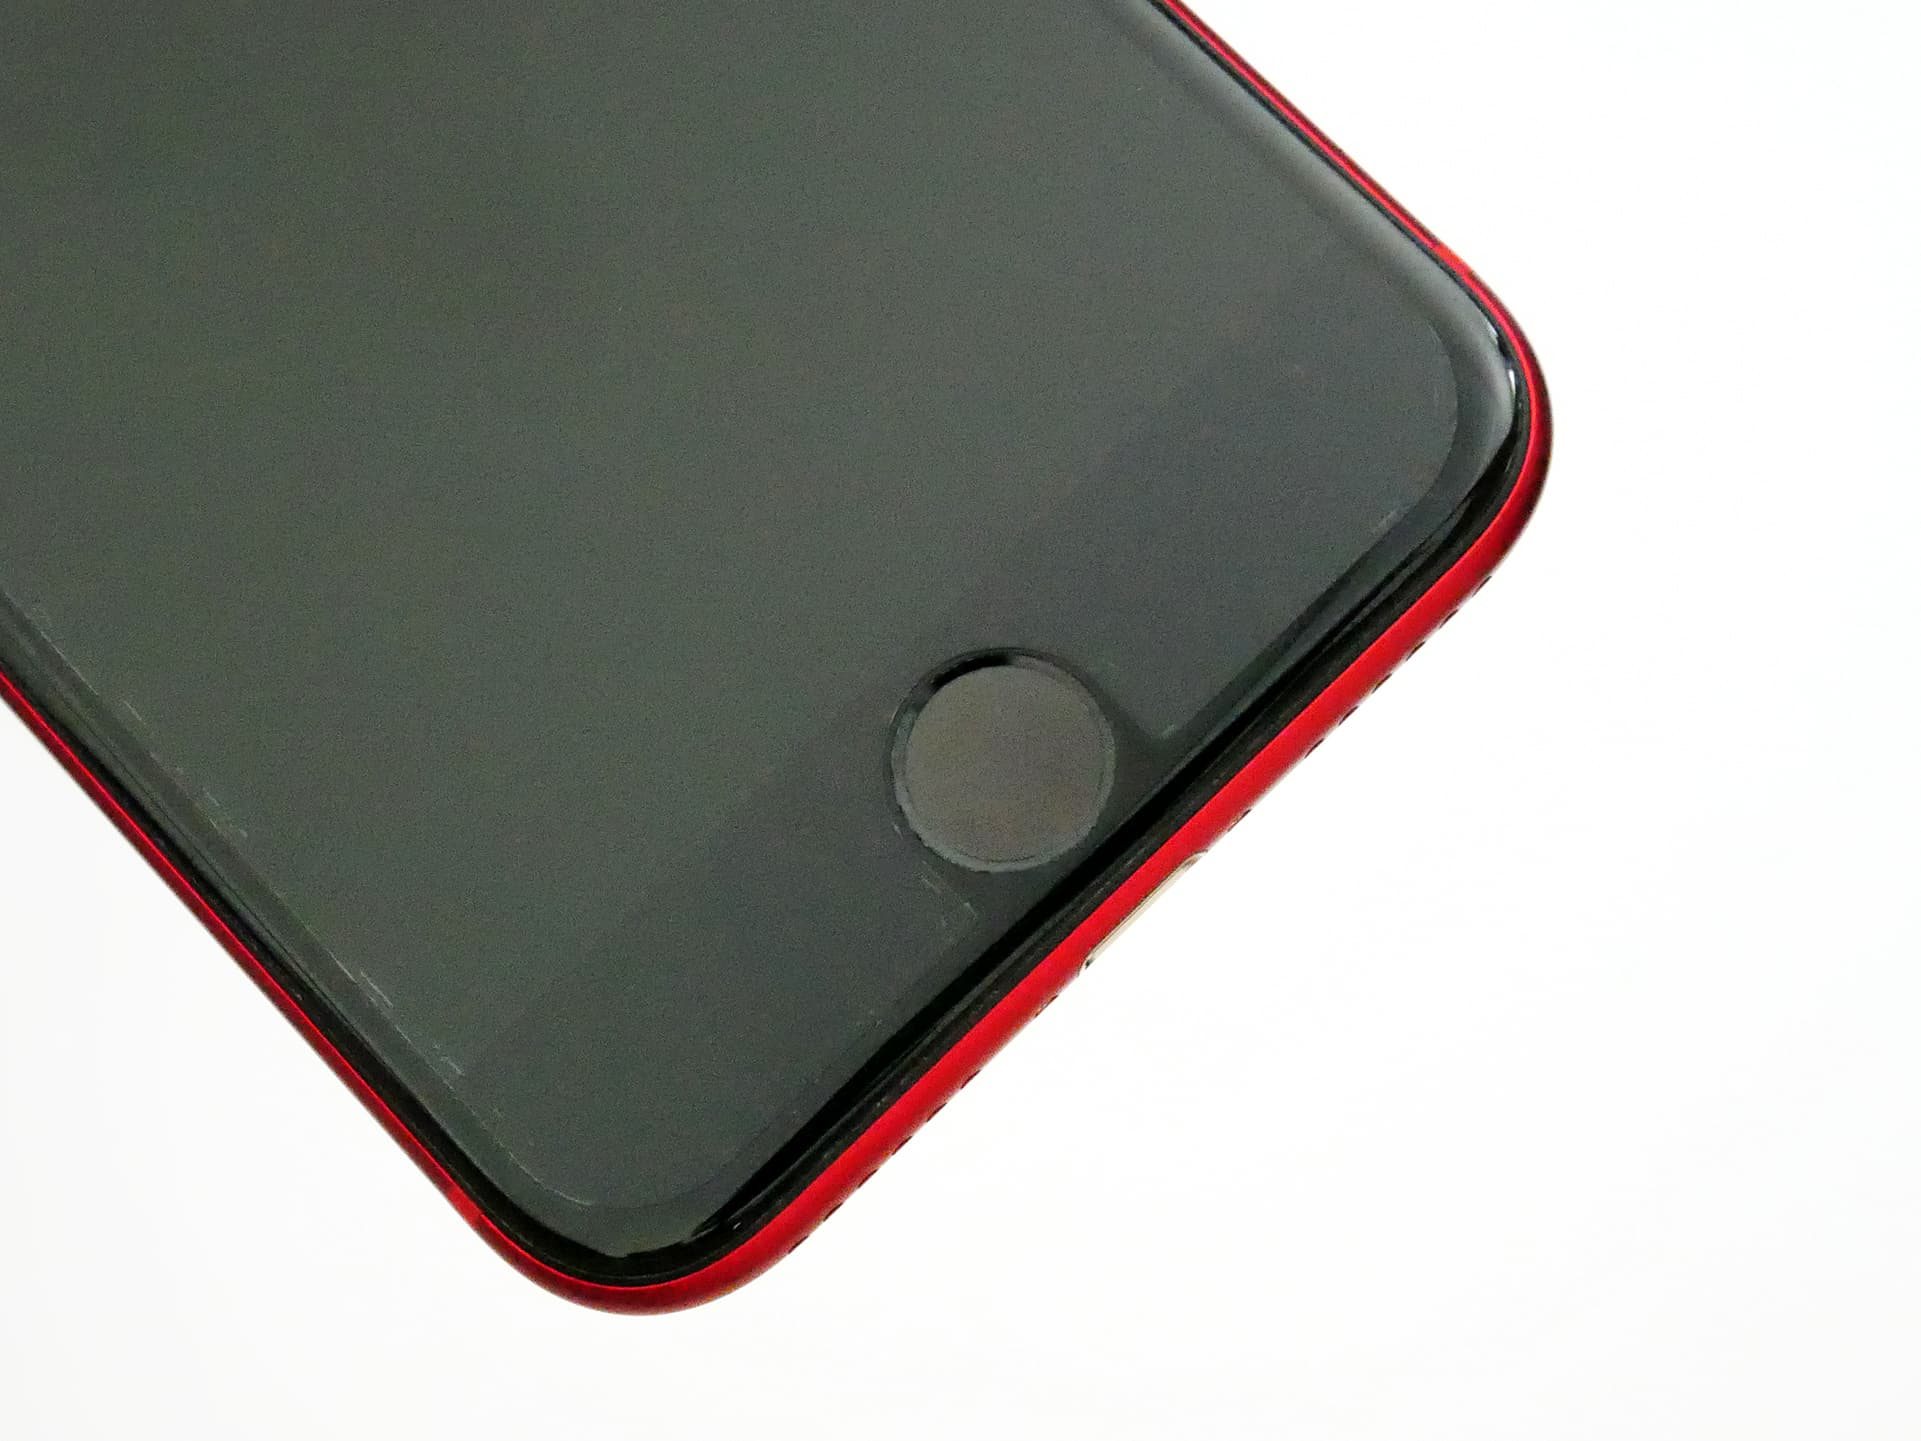 iPhone SE 下部ホームボタン